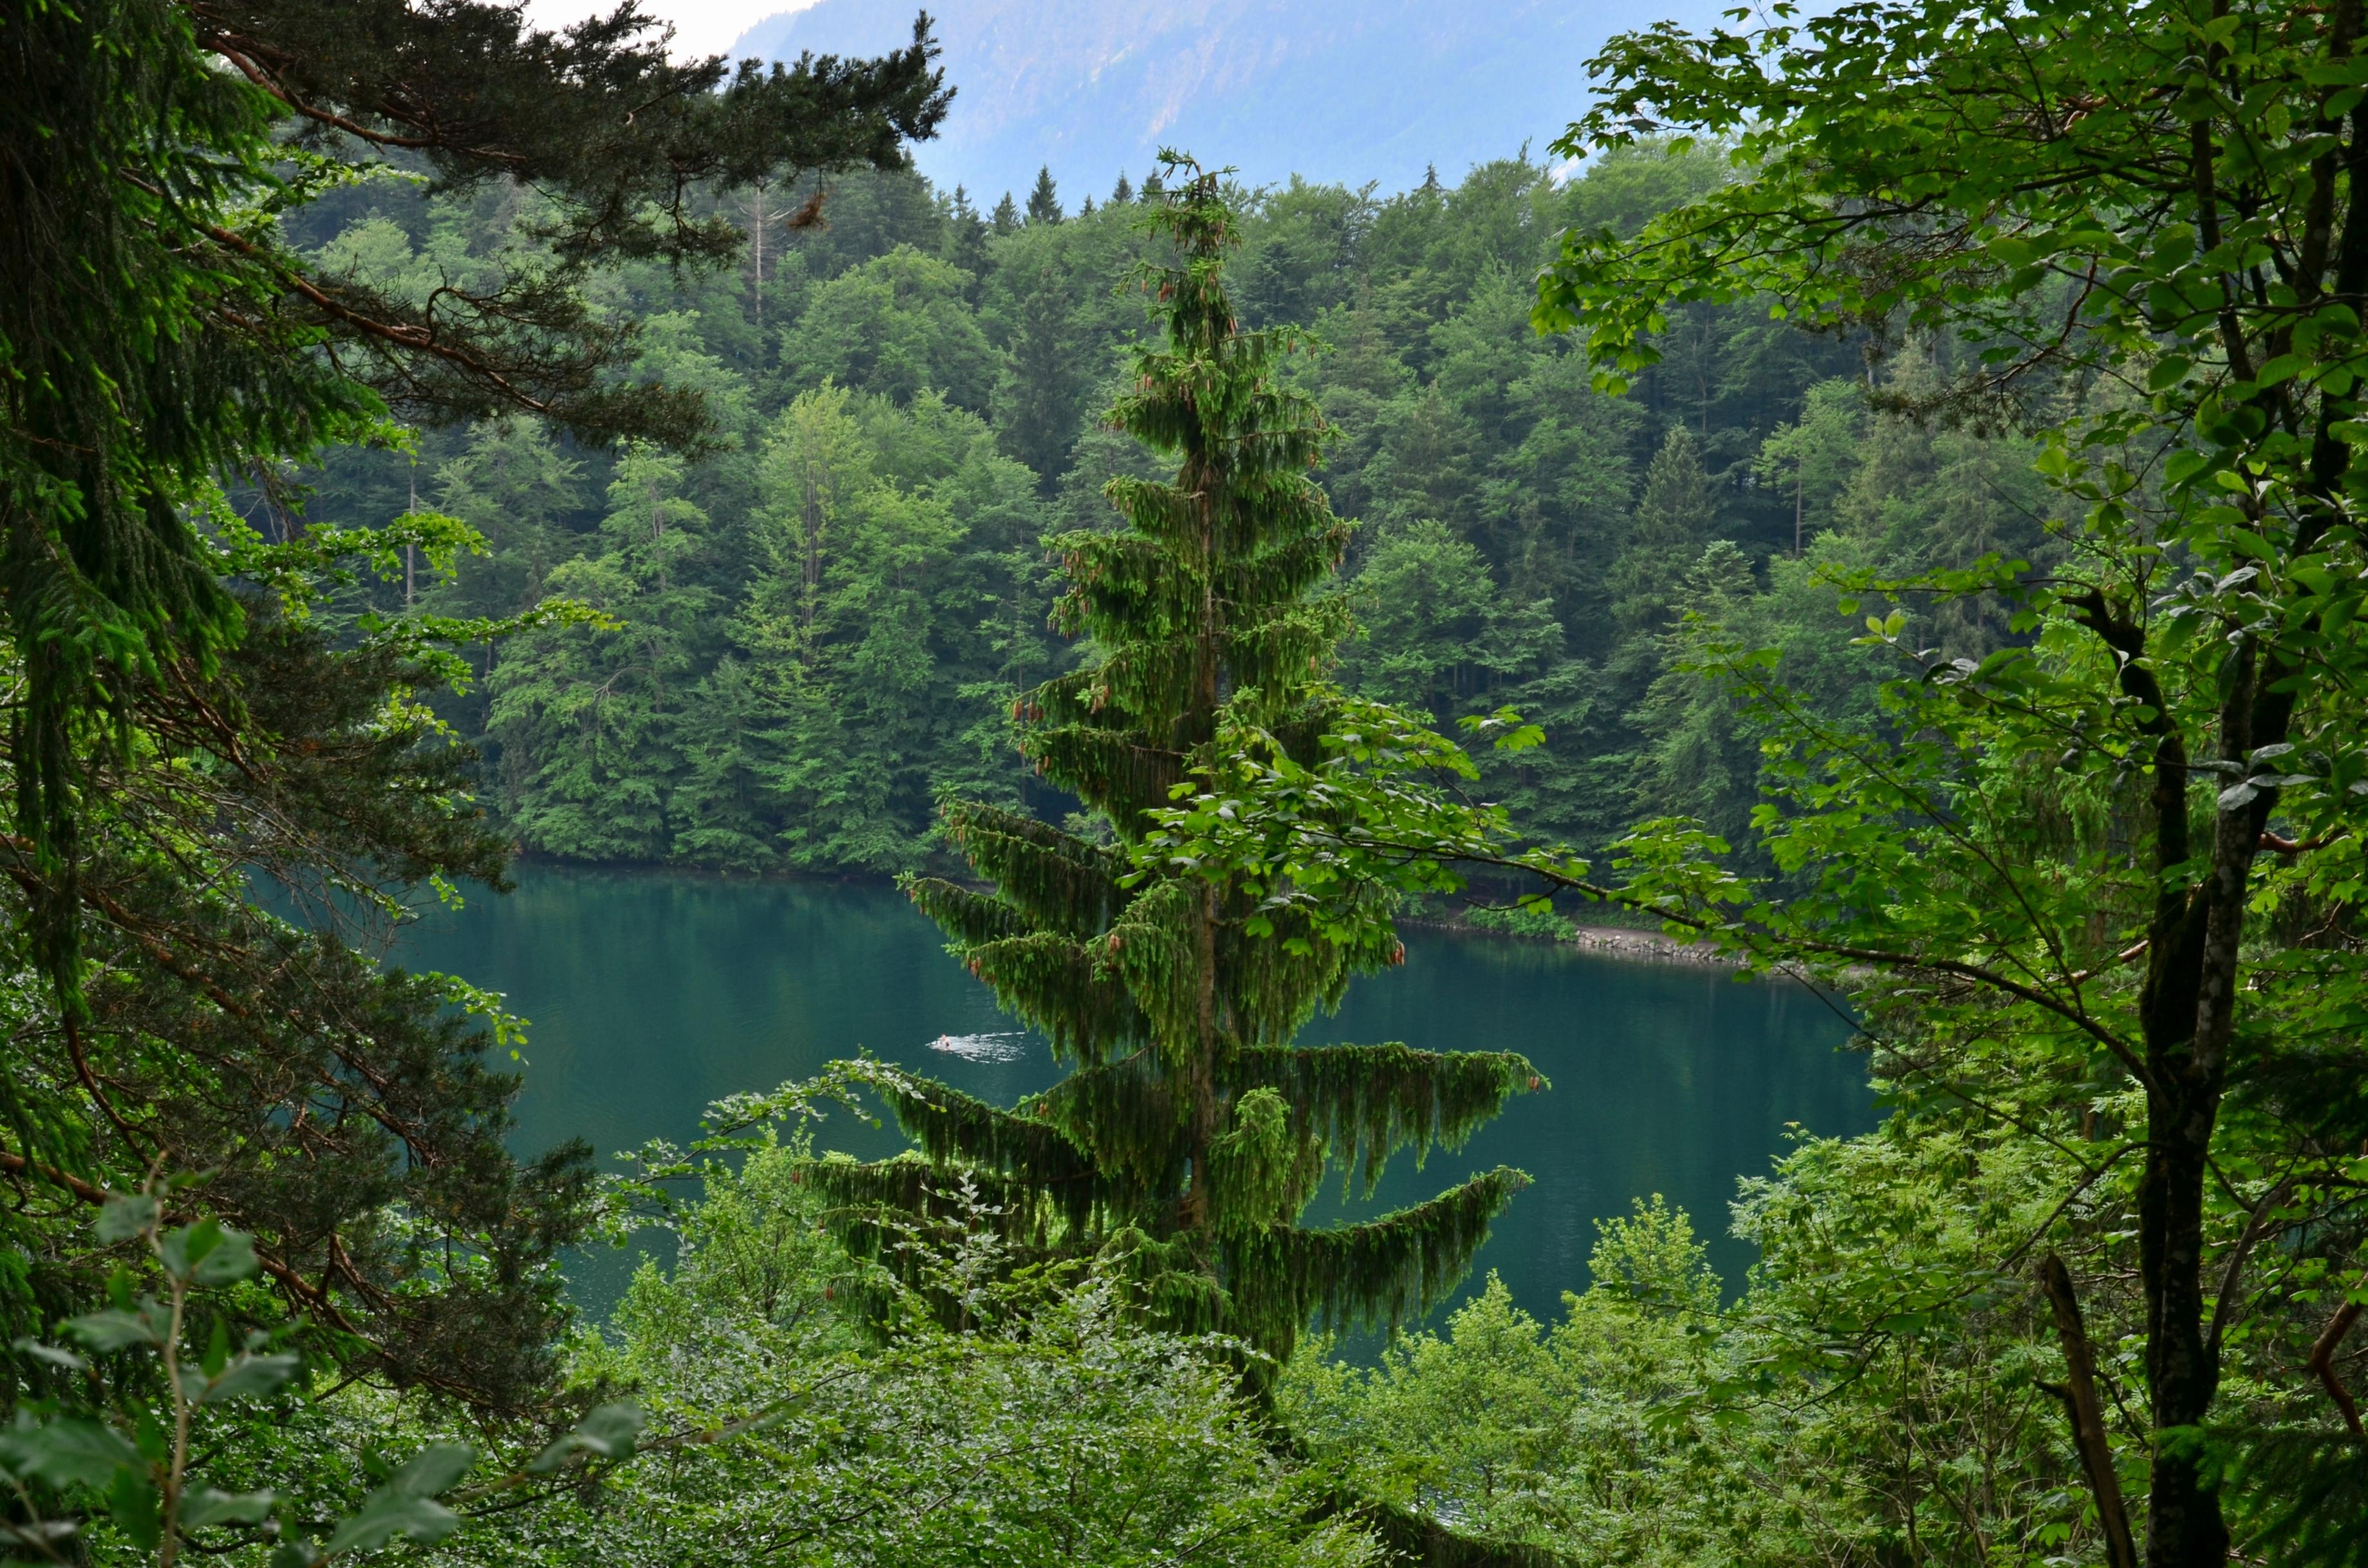 A0043_Saloberalm_Blick_auf_Alatsee_durch_Bäume.jpg